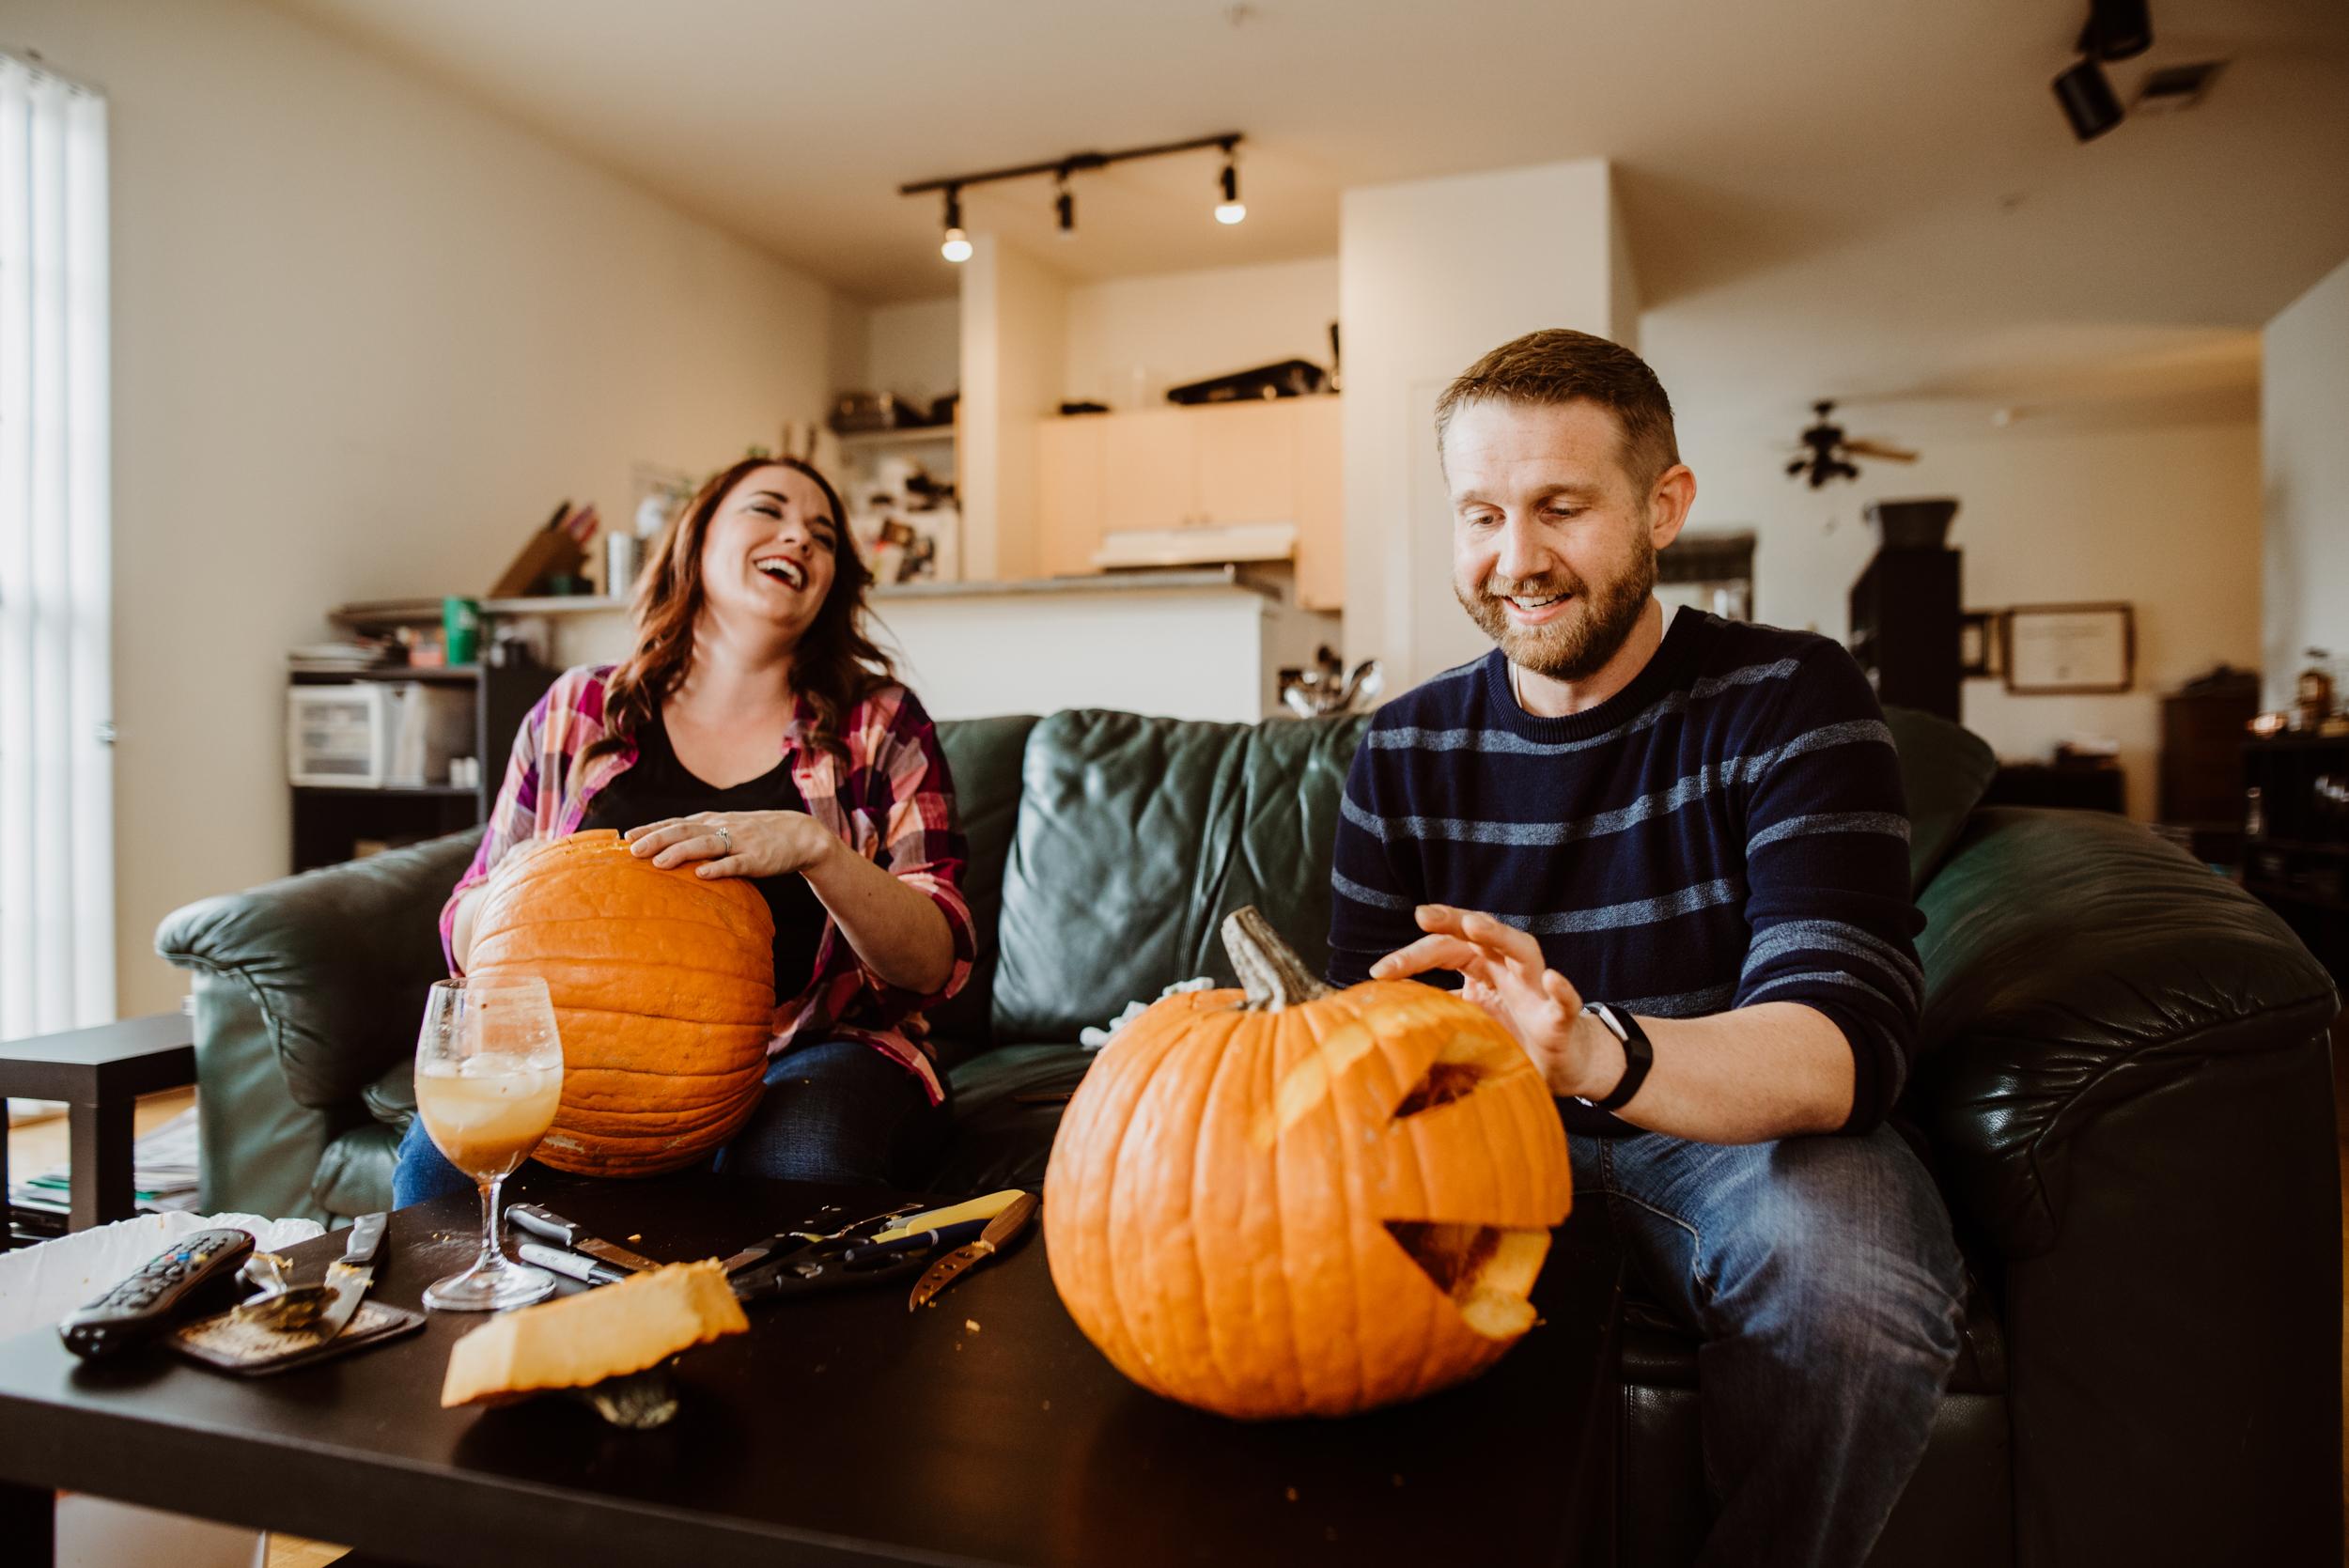 Amanda&Jason - Denver Pumpkin Carving (32 of 52).jpg